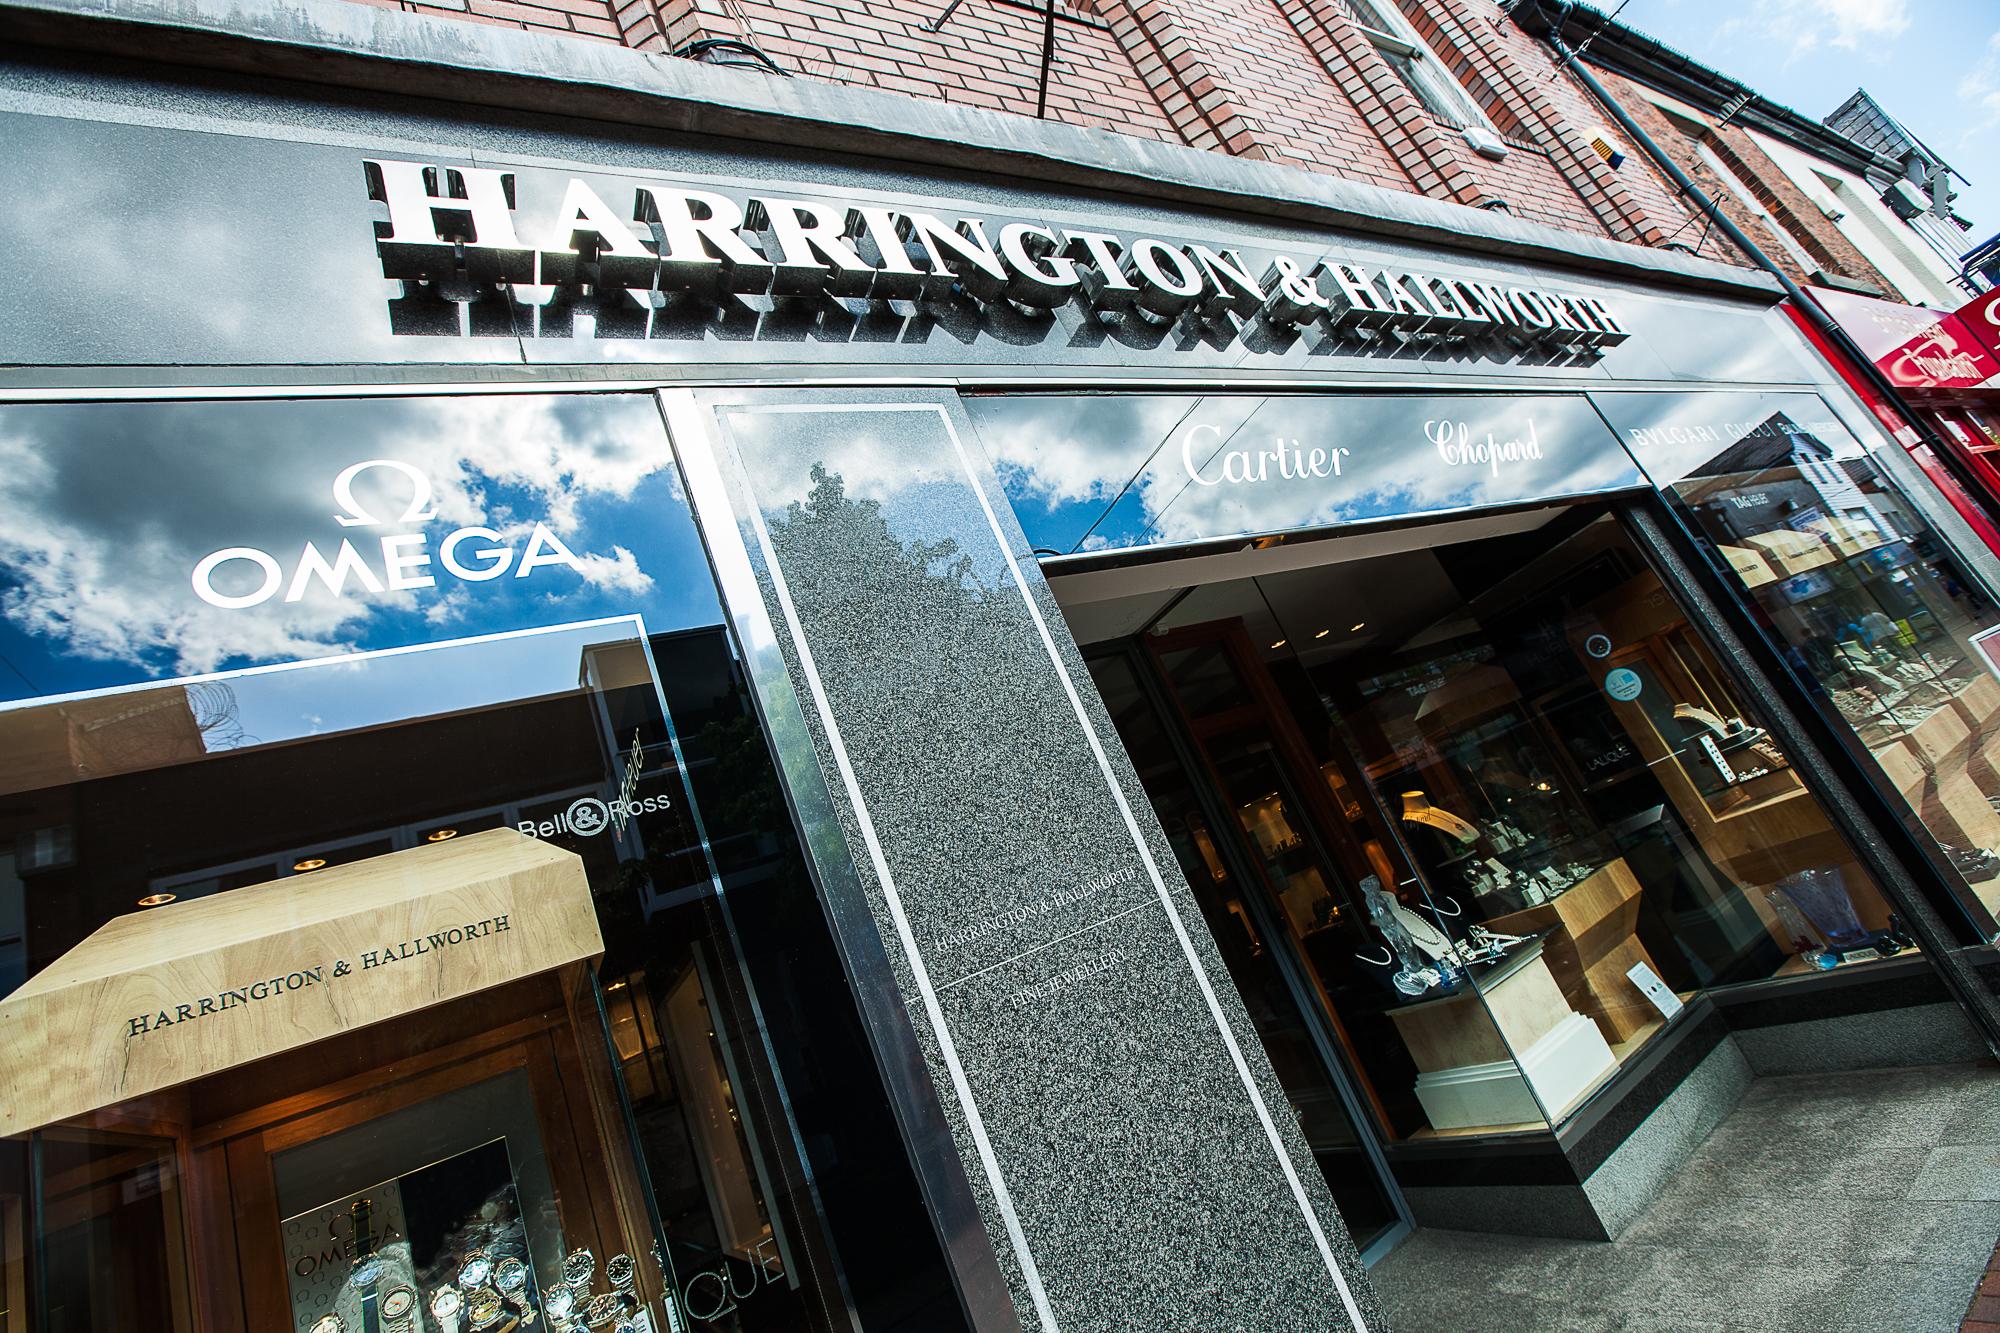 harrington-hallworth-exteriors-2